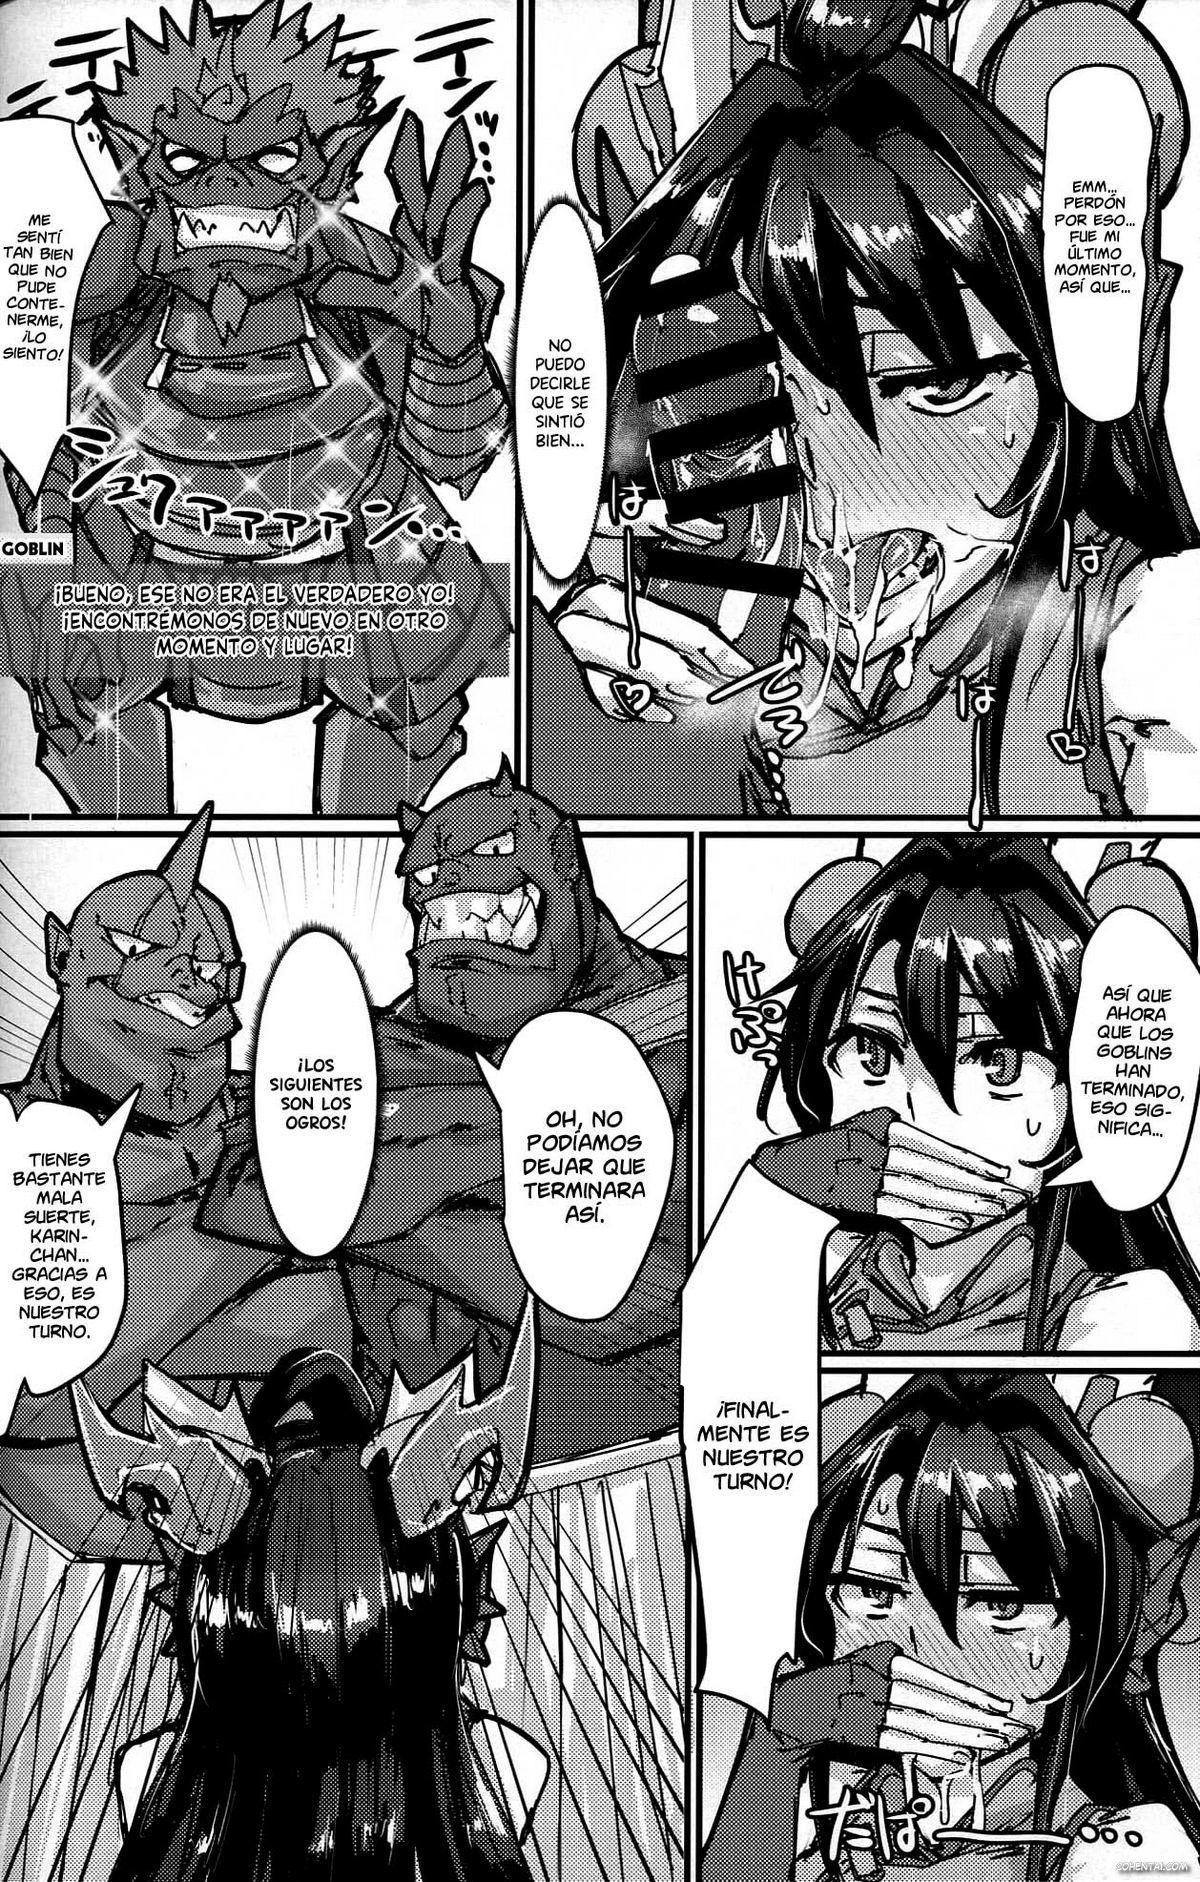 Okuchi to Ketsu kara Plus o Sosogu Hon (Puzzle & Dragons)